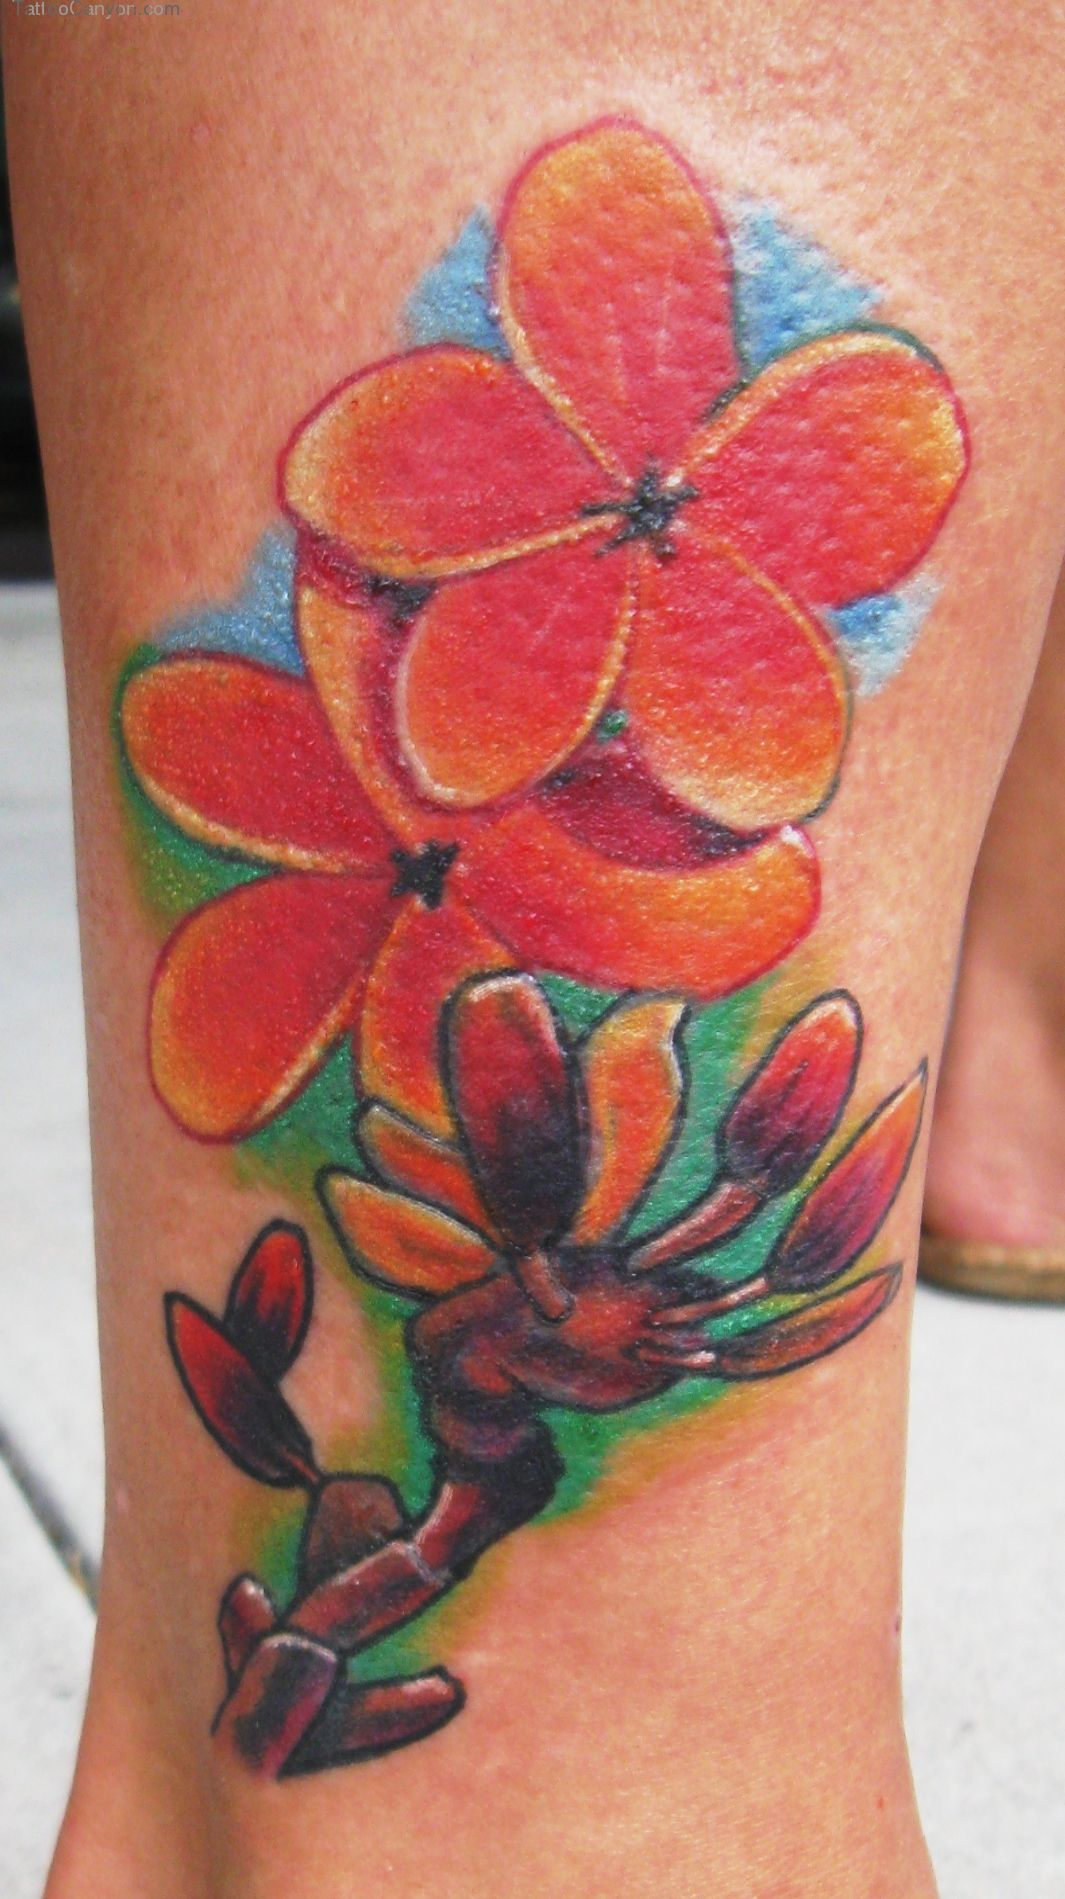 Hawaiian flower tattoos designs and ideas picture 2240 1 hawaiian flower tattoos designs and ideas picture 2240 izmirmasajfo